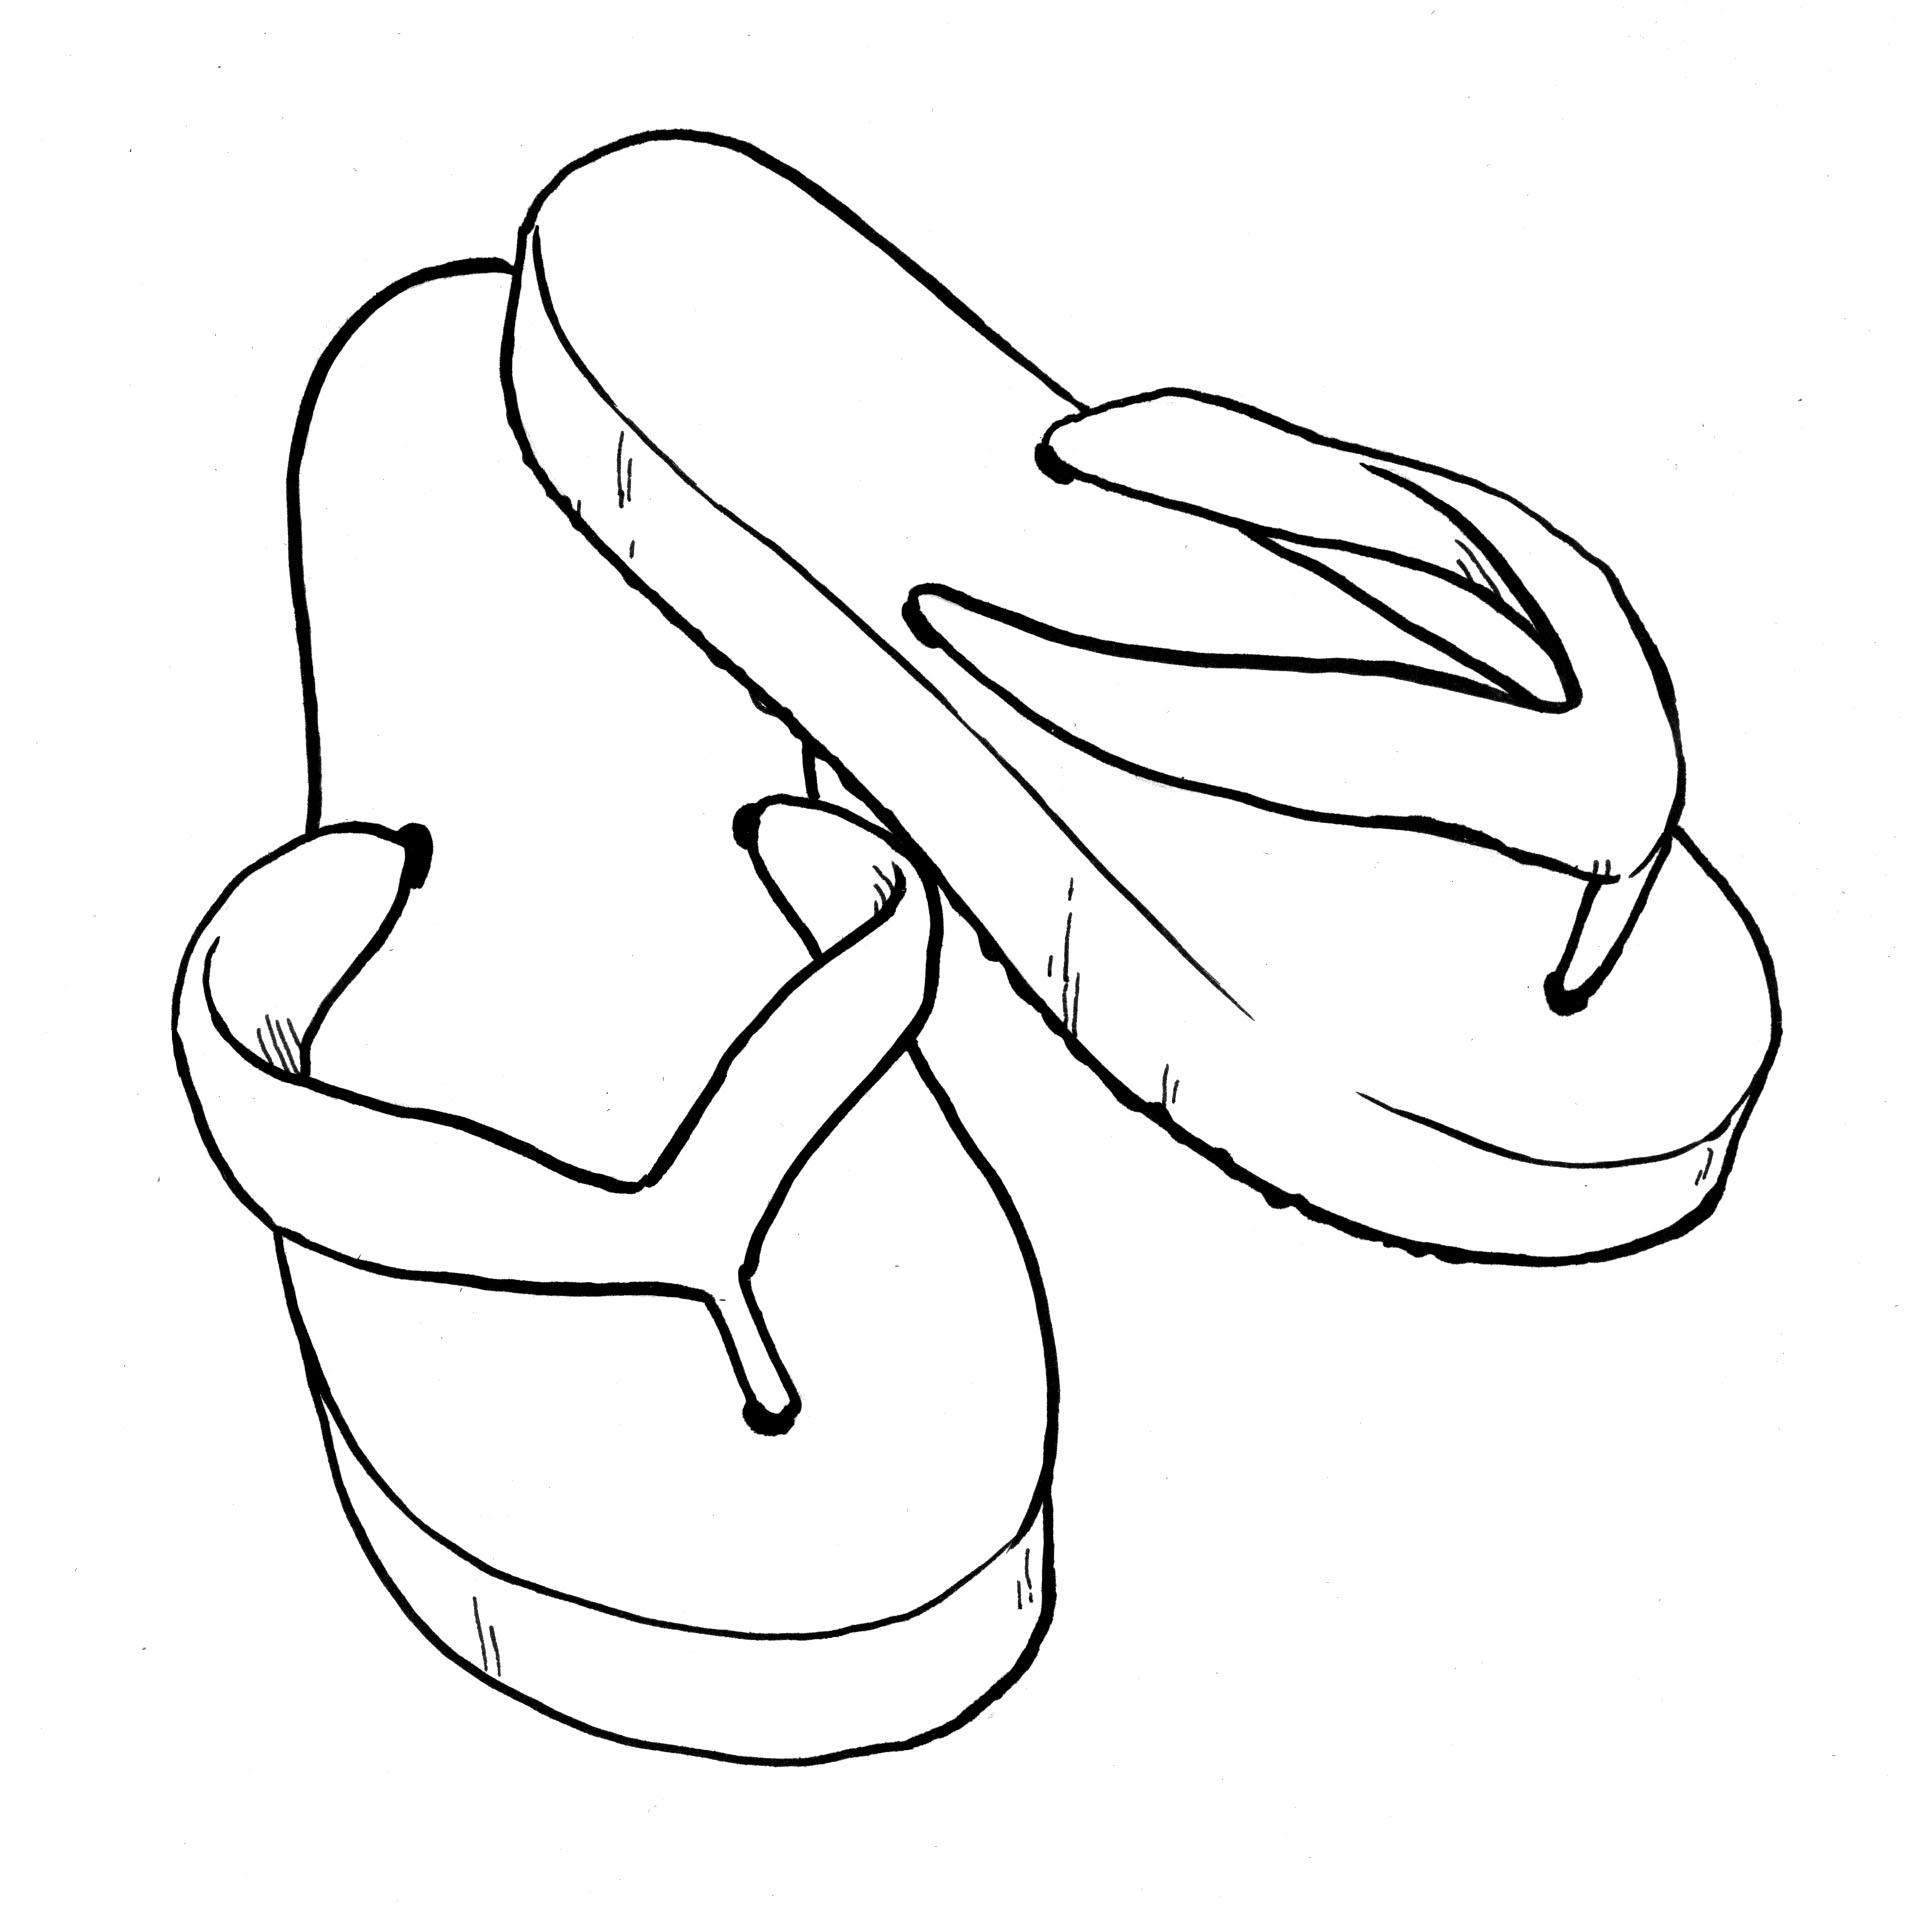 Sandal clipart black and white #9